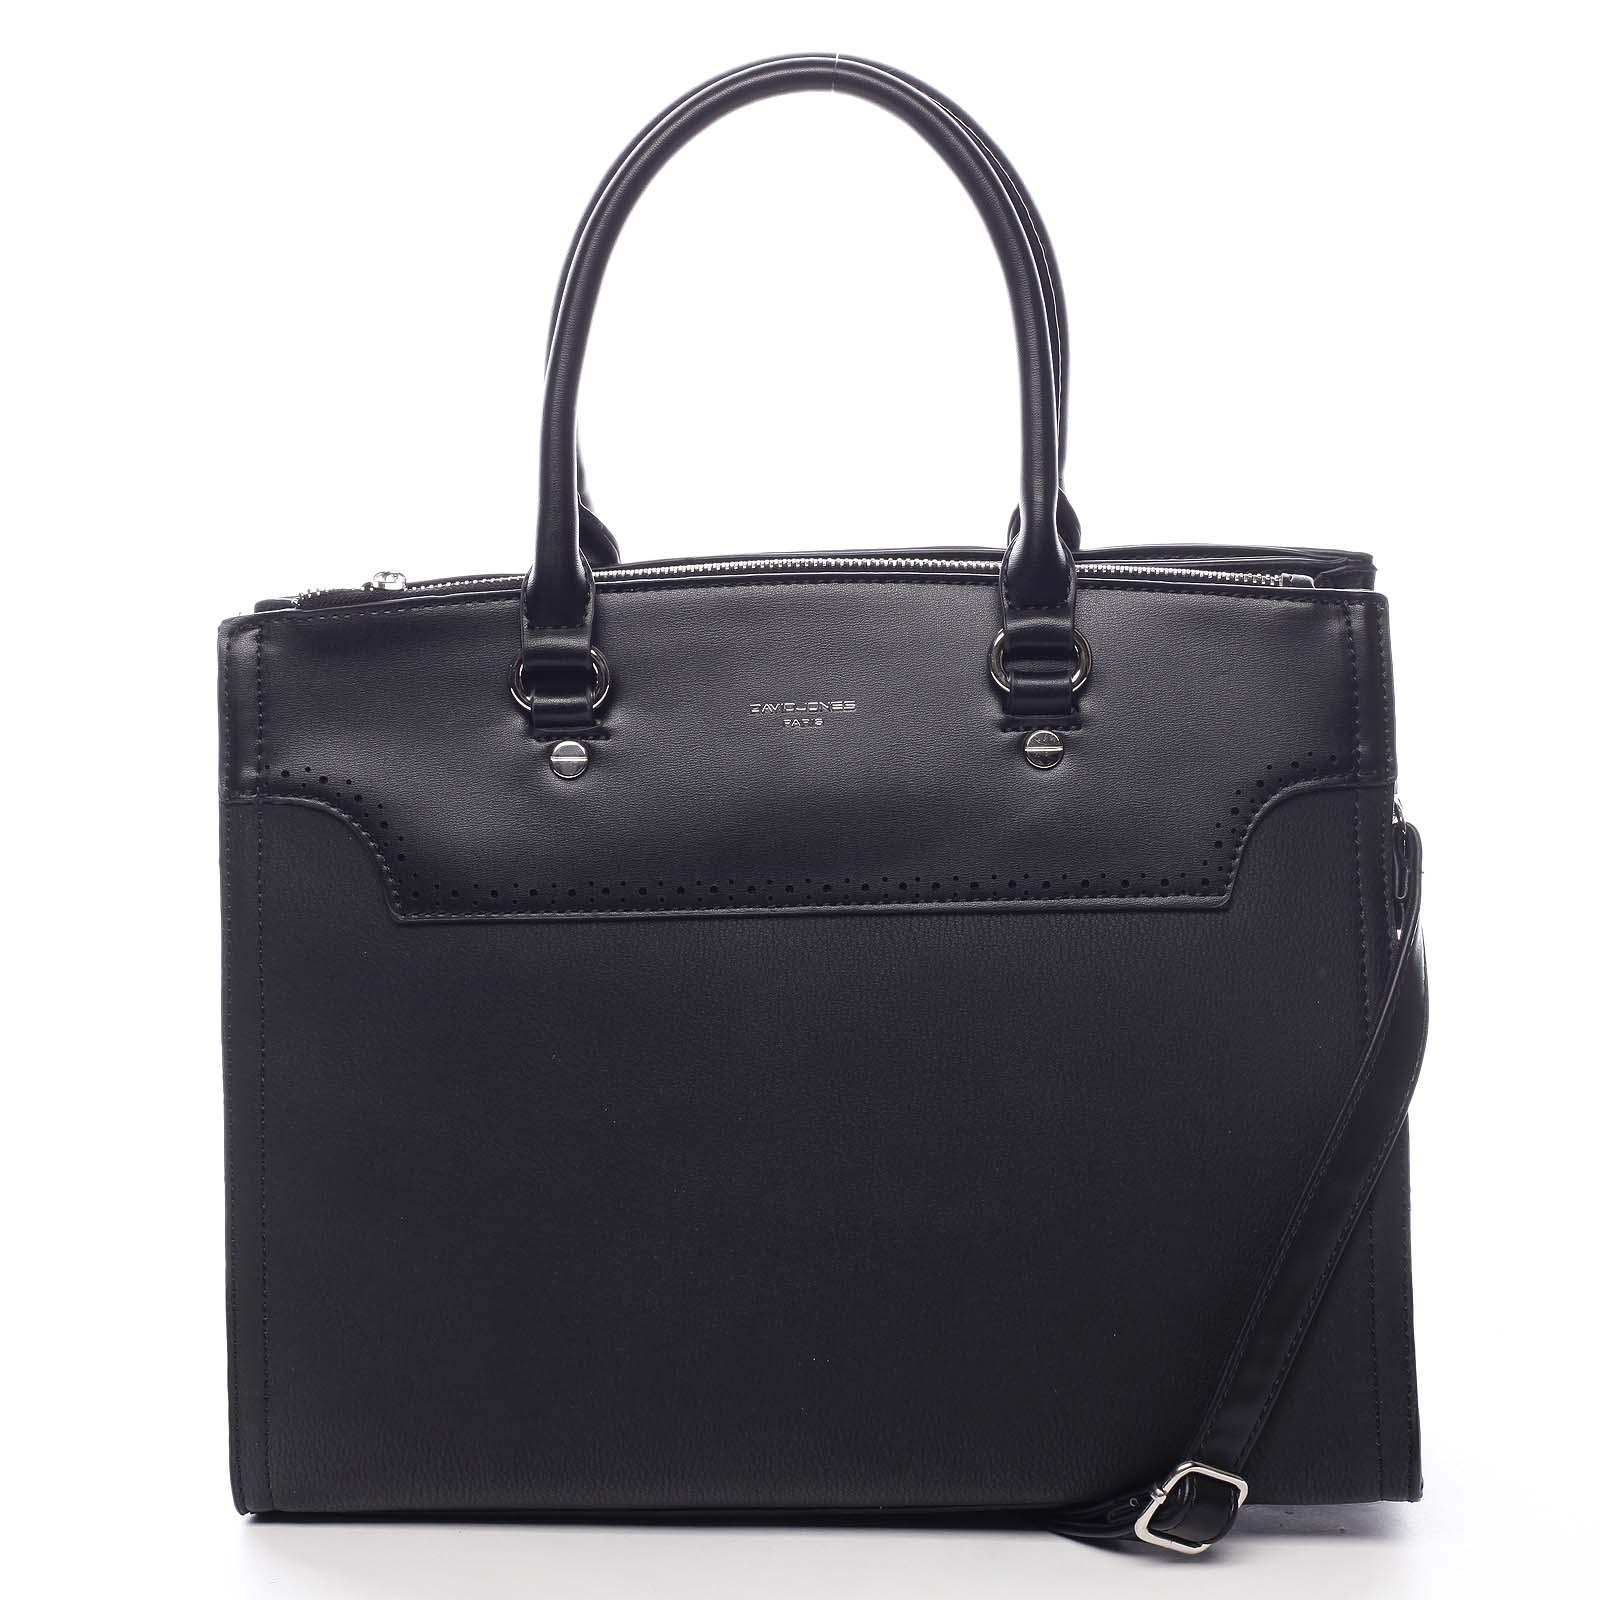 Dámska kabelka čierna - David Jones Cimberly čierna